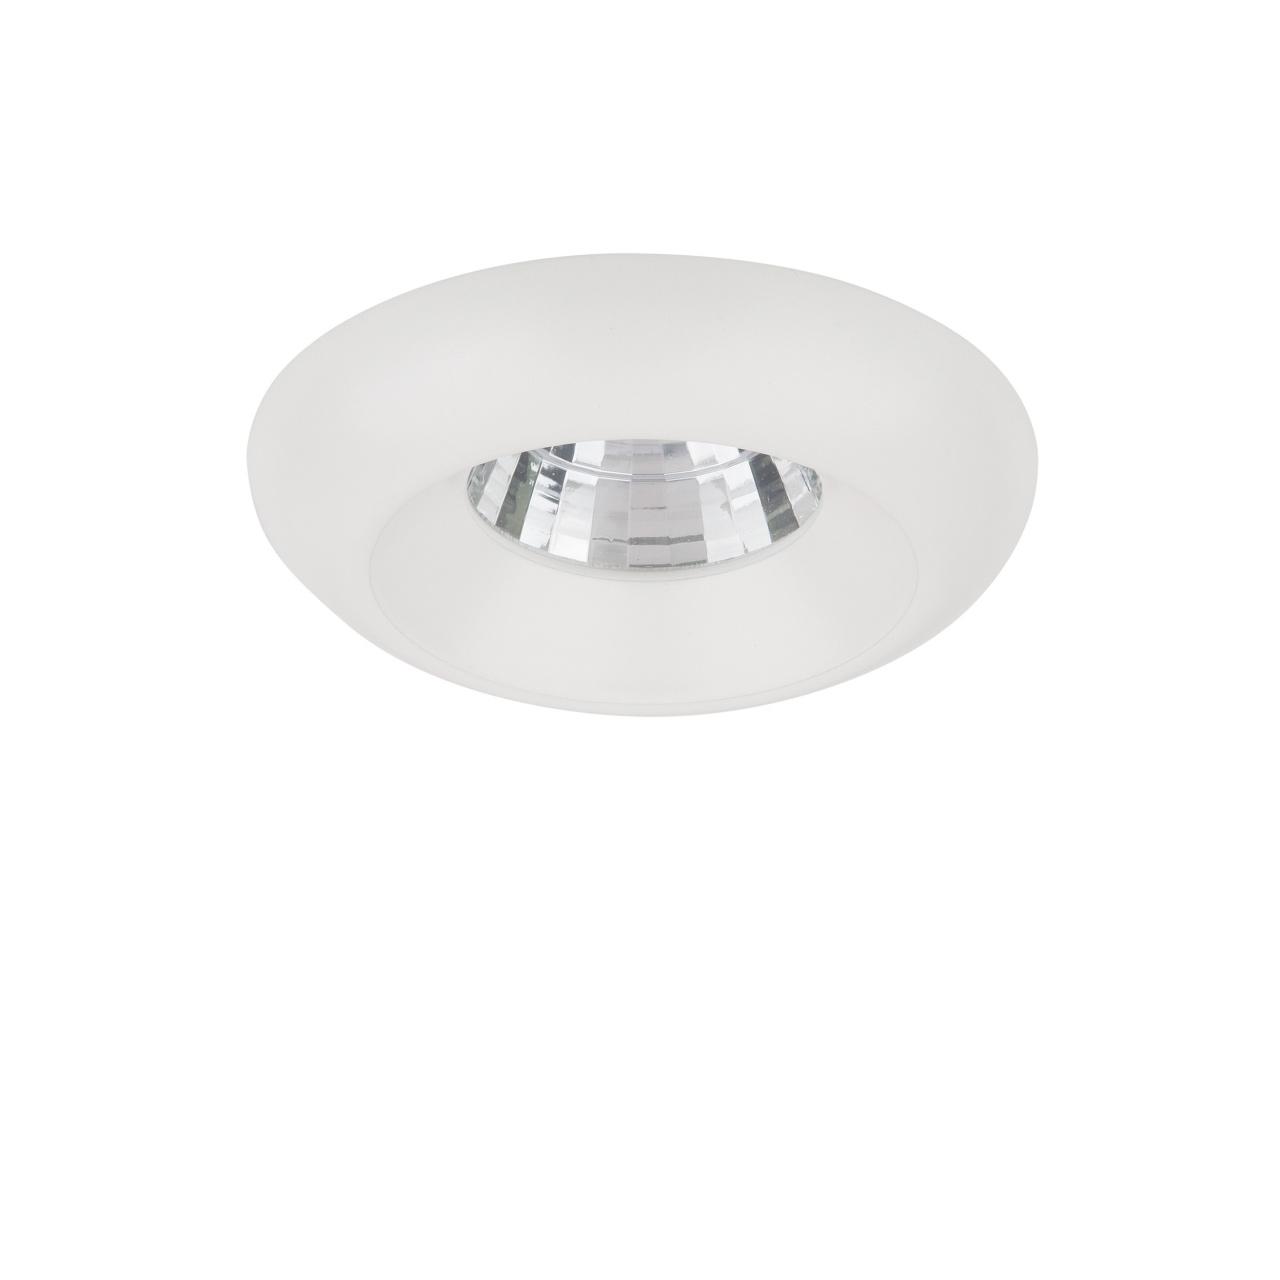 Светильник Monde LED 5W 400LM 50G белый 3000K Lightstar 071056